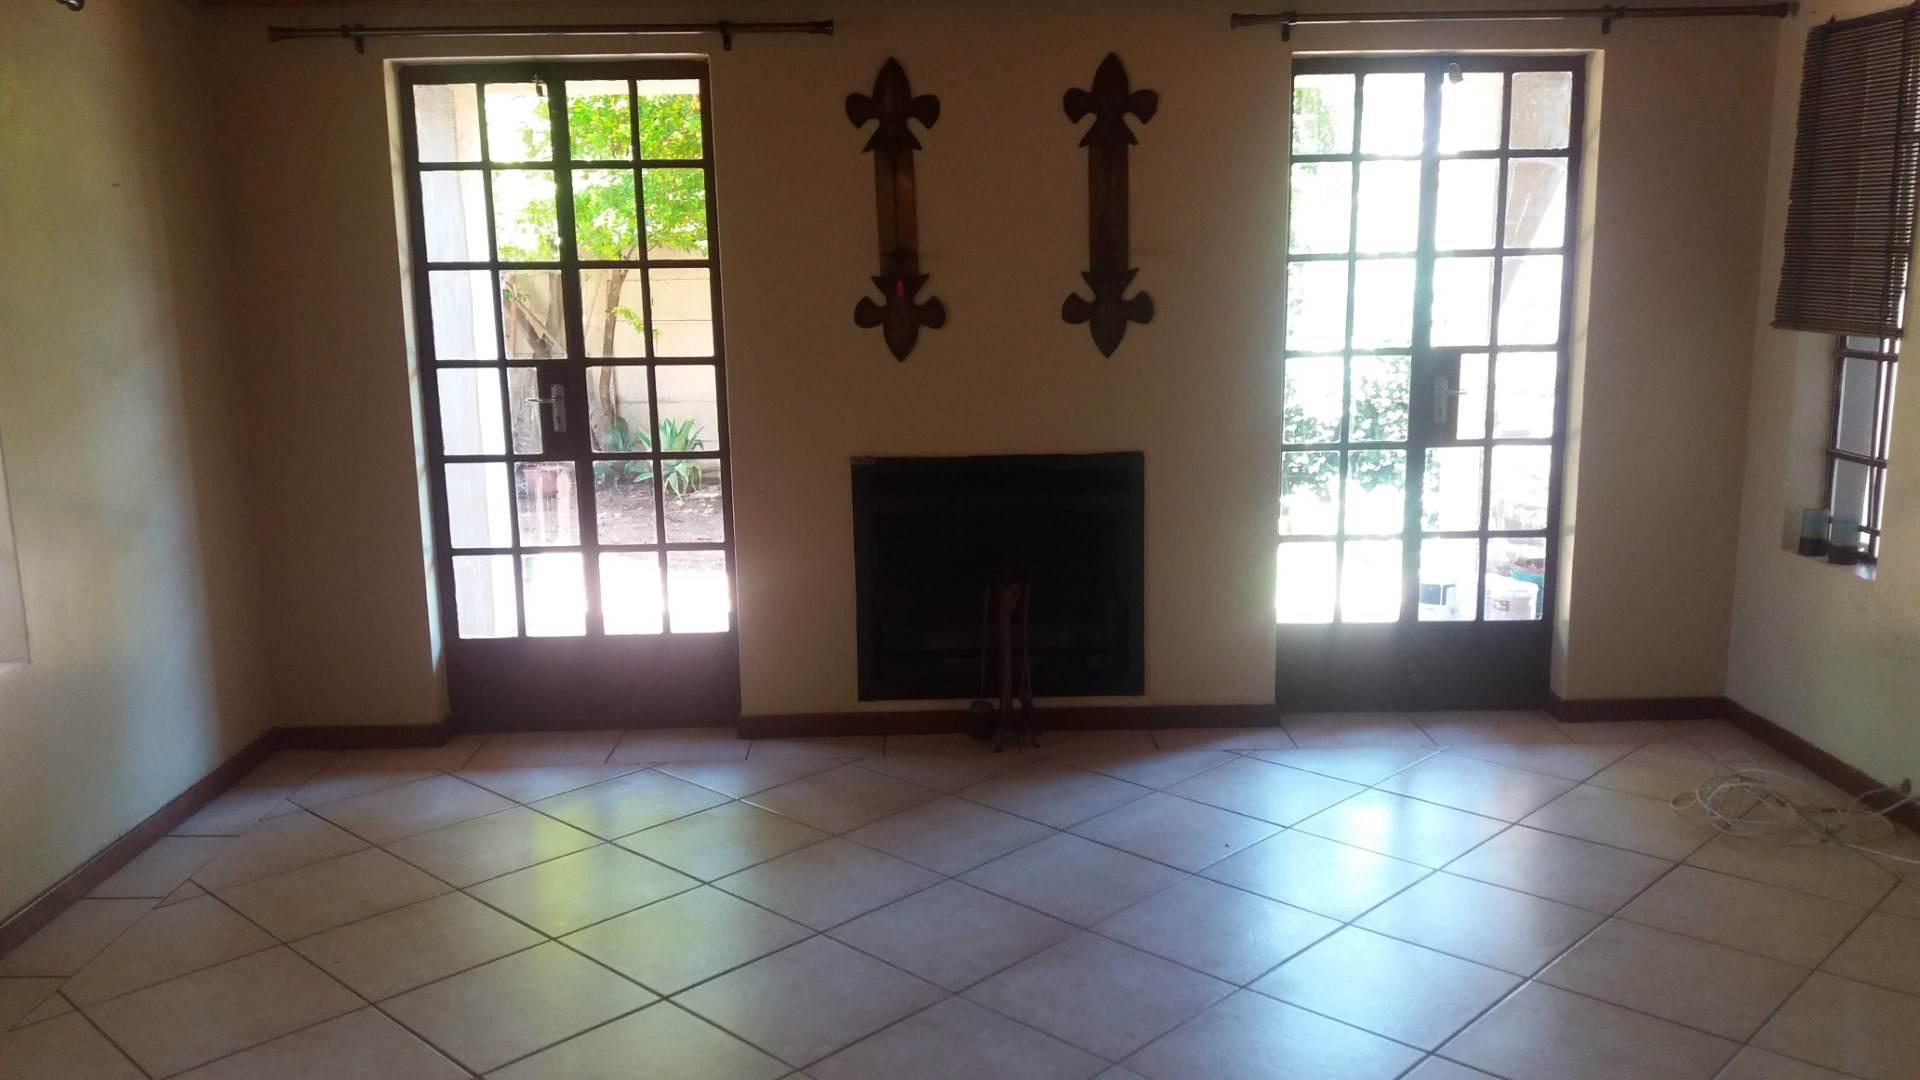 Moreleta Park property for sale. Ref No: 13550634. Picture no 8